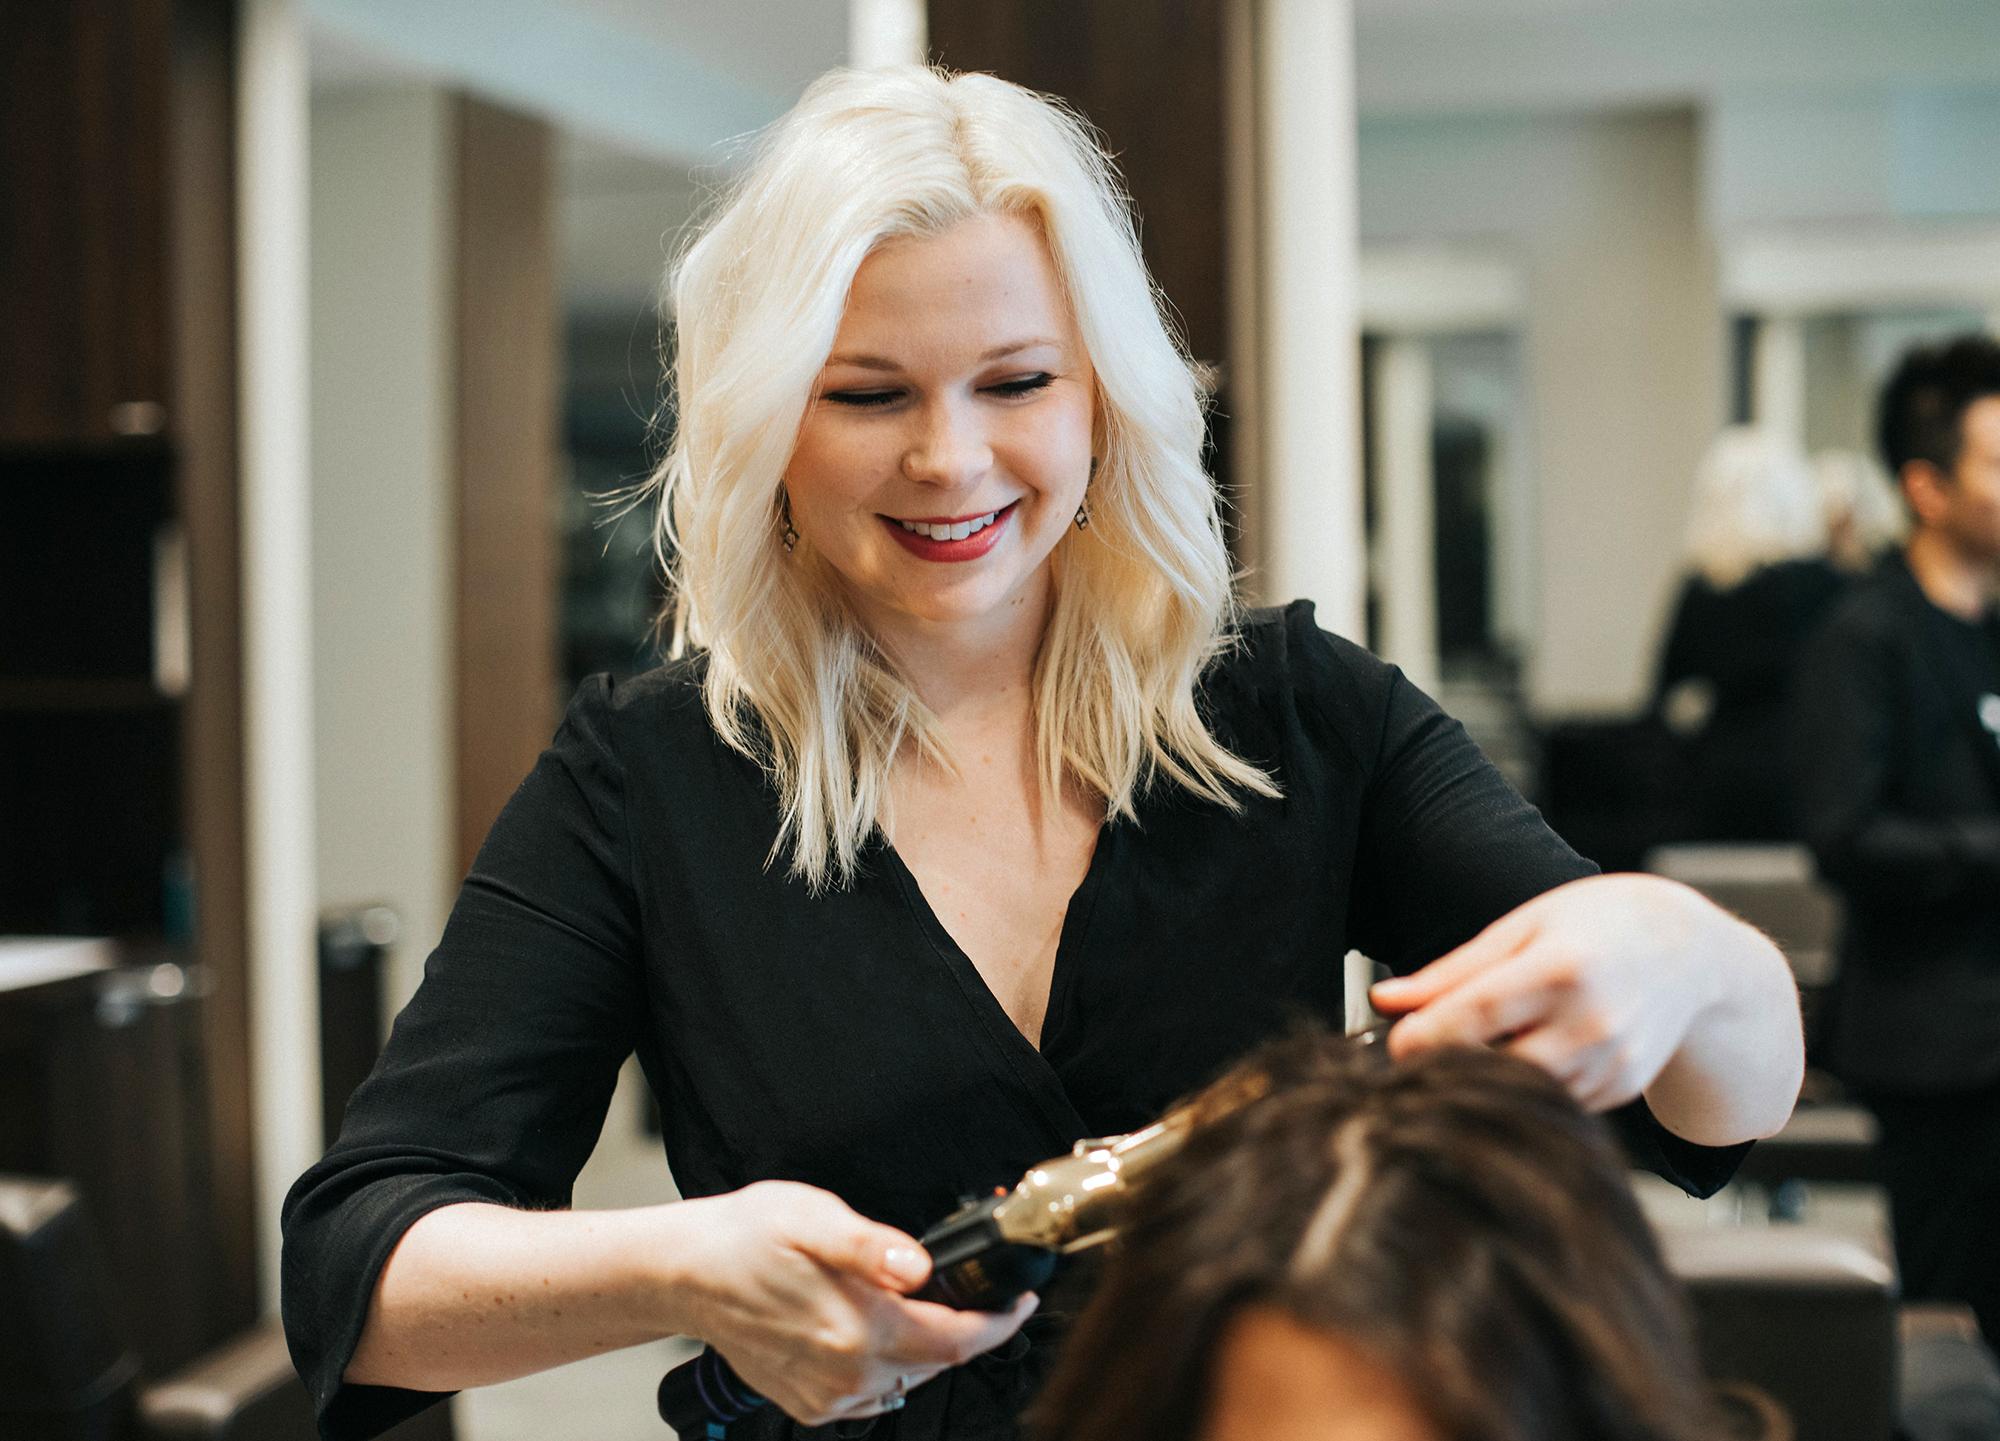 Kelsey Gohl / Hair stylist